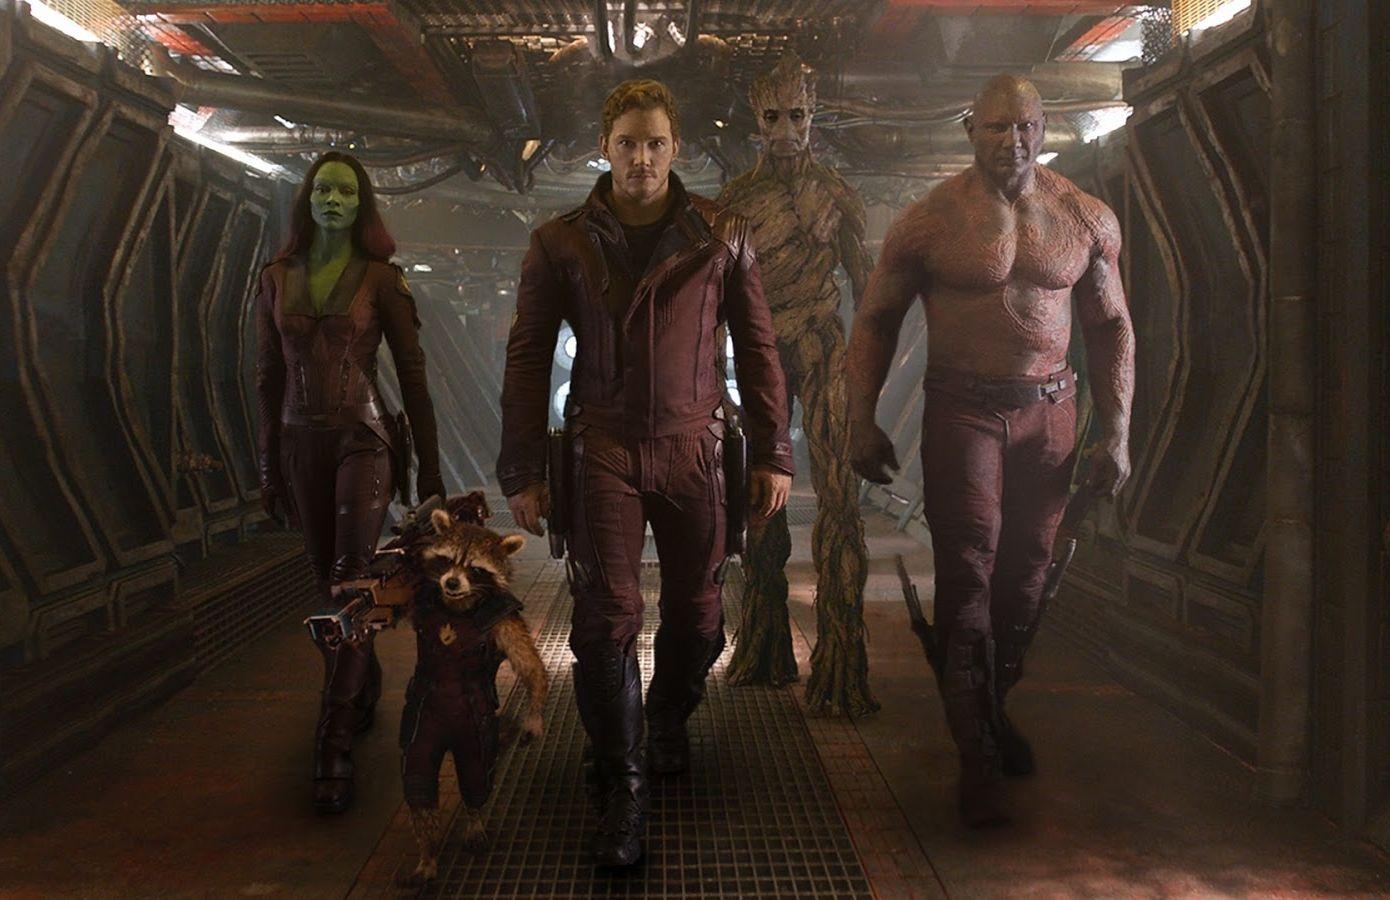 Guardians of the Galaxy: ecco Chris Pratt, Bradley Cooper, Zoe Saldana e gli altri guardiani